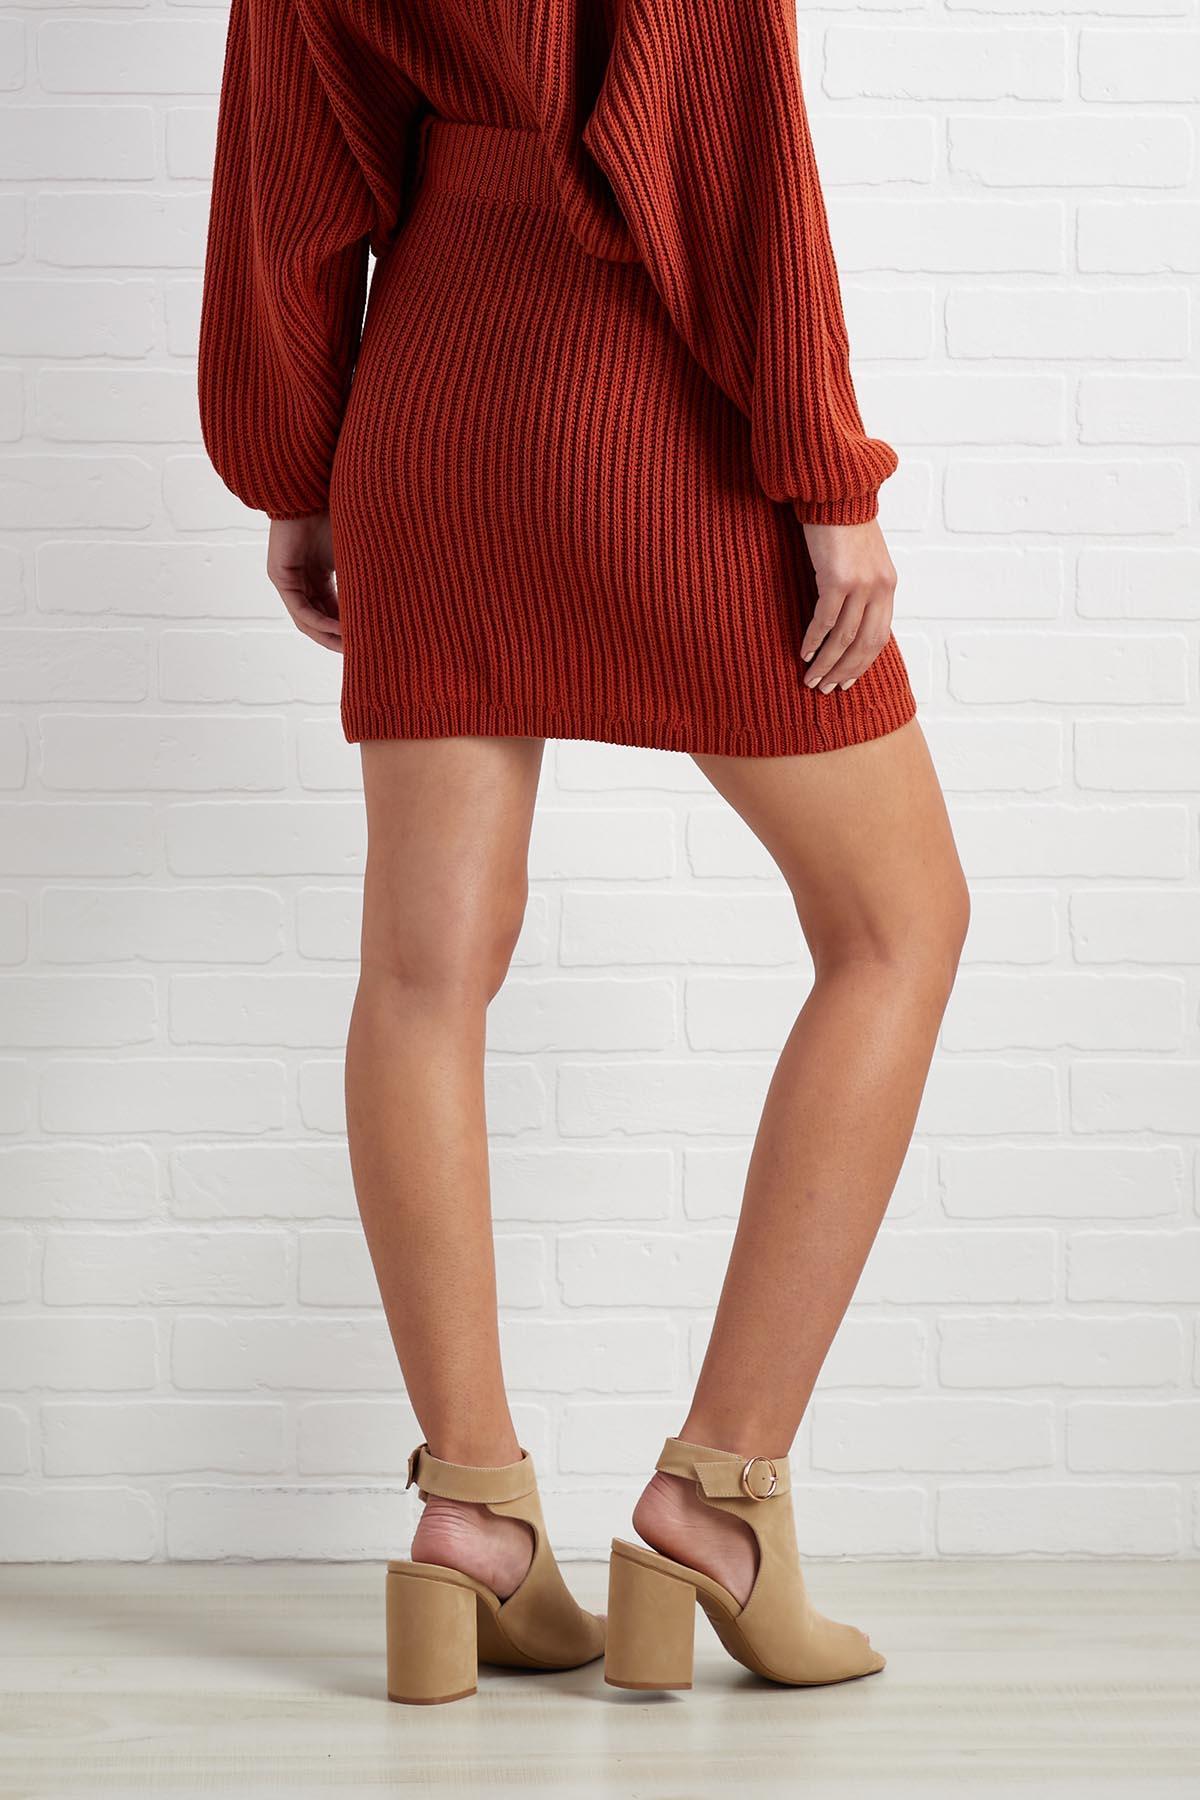 Fall Semester Skirt